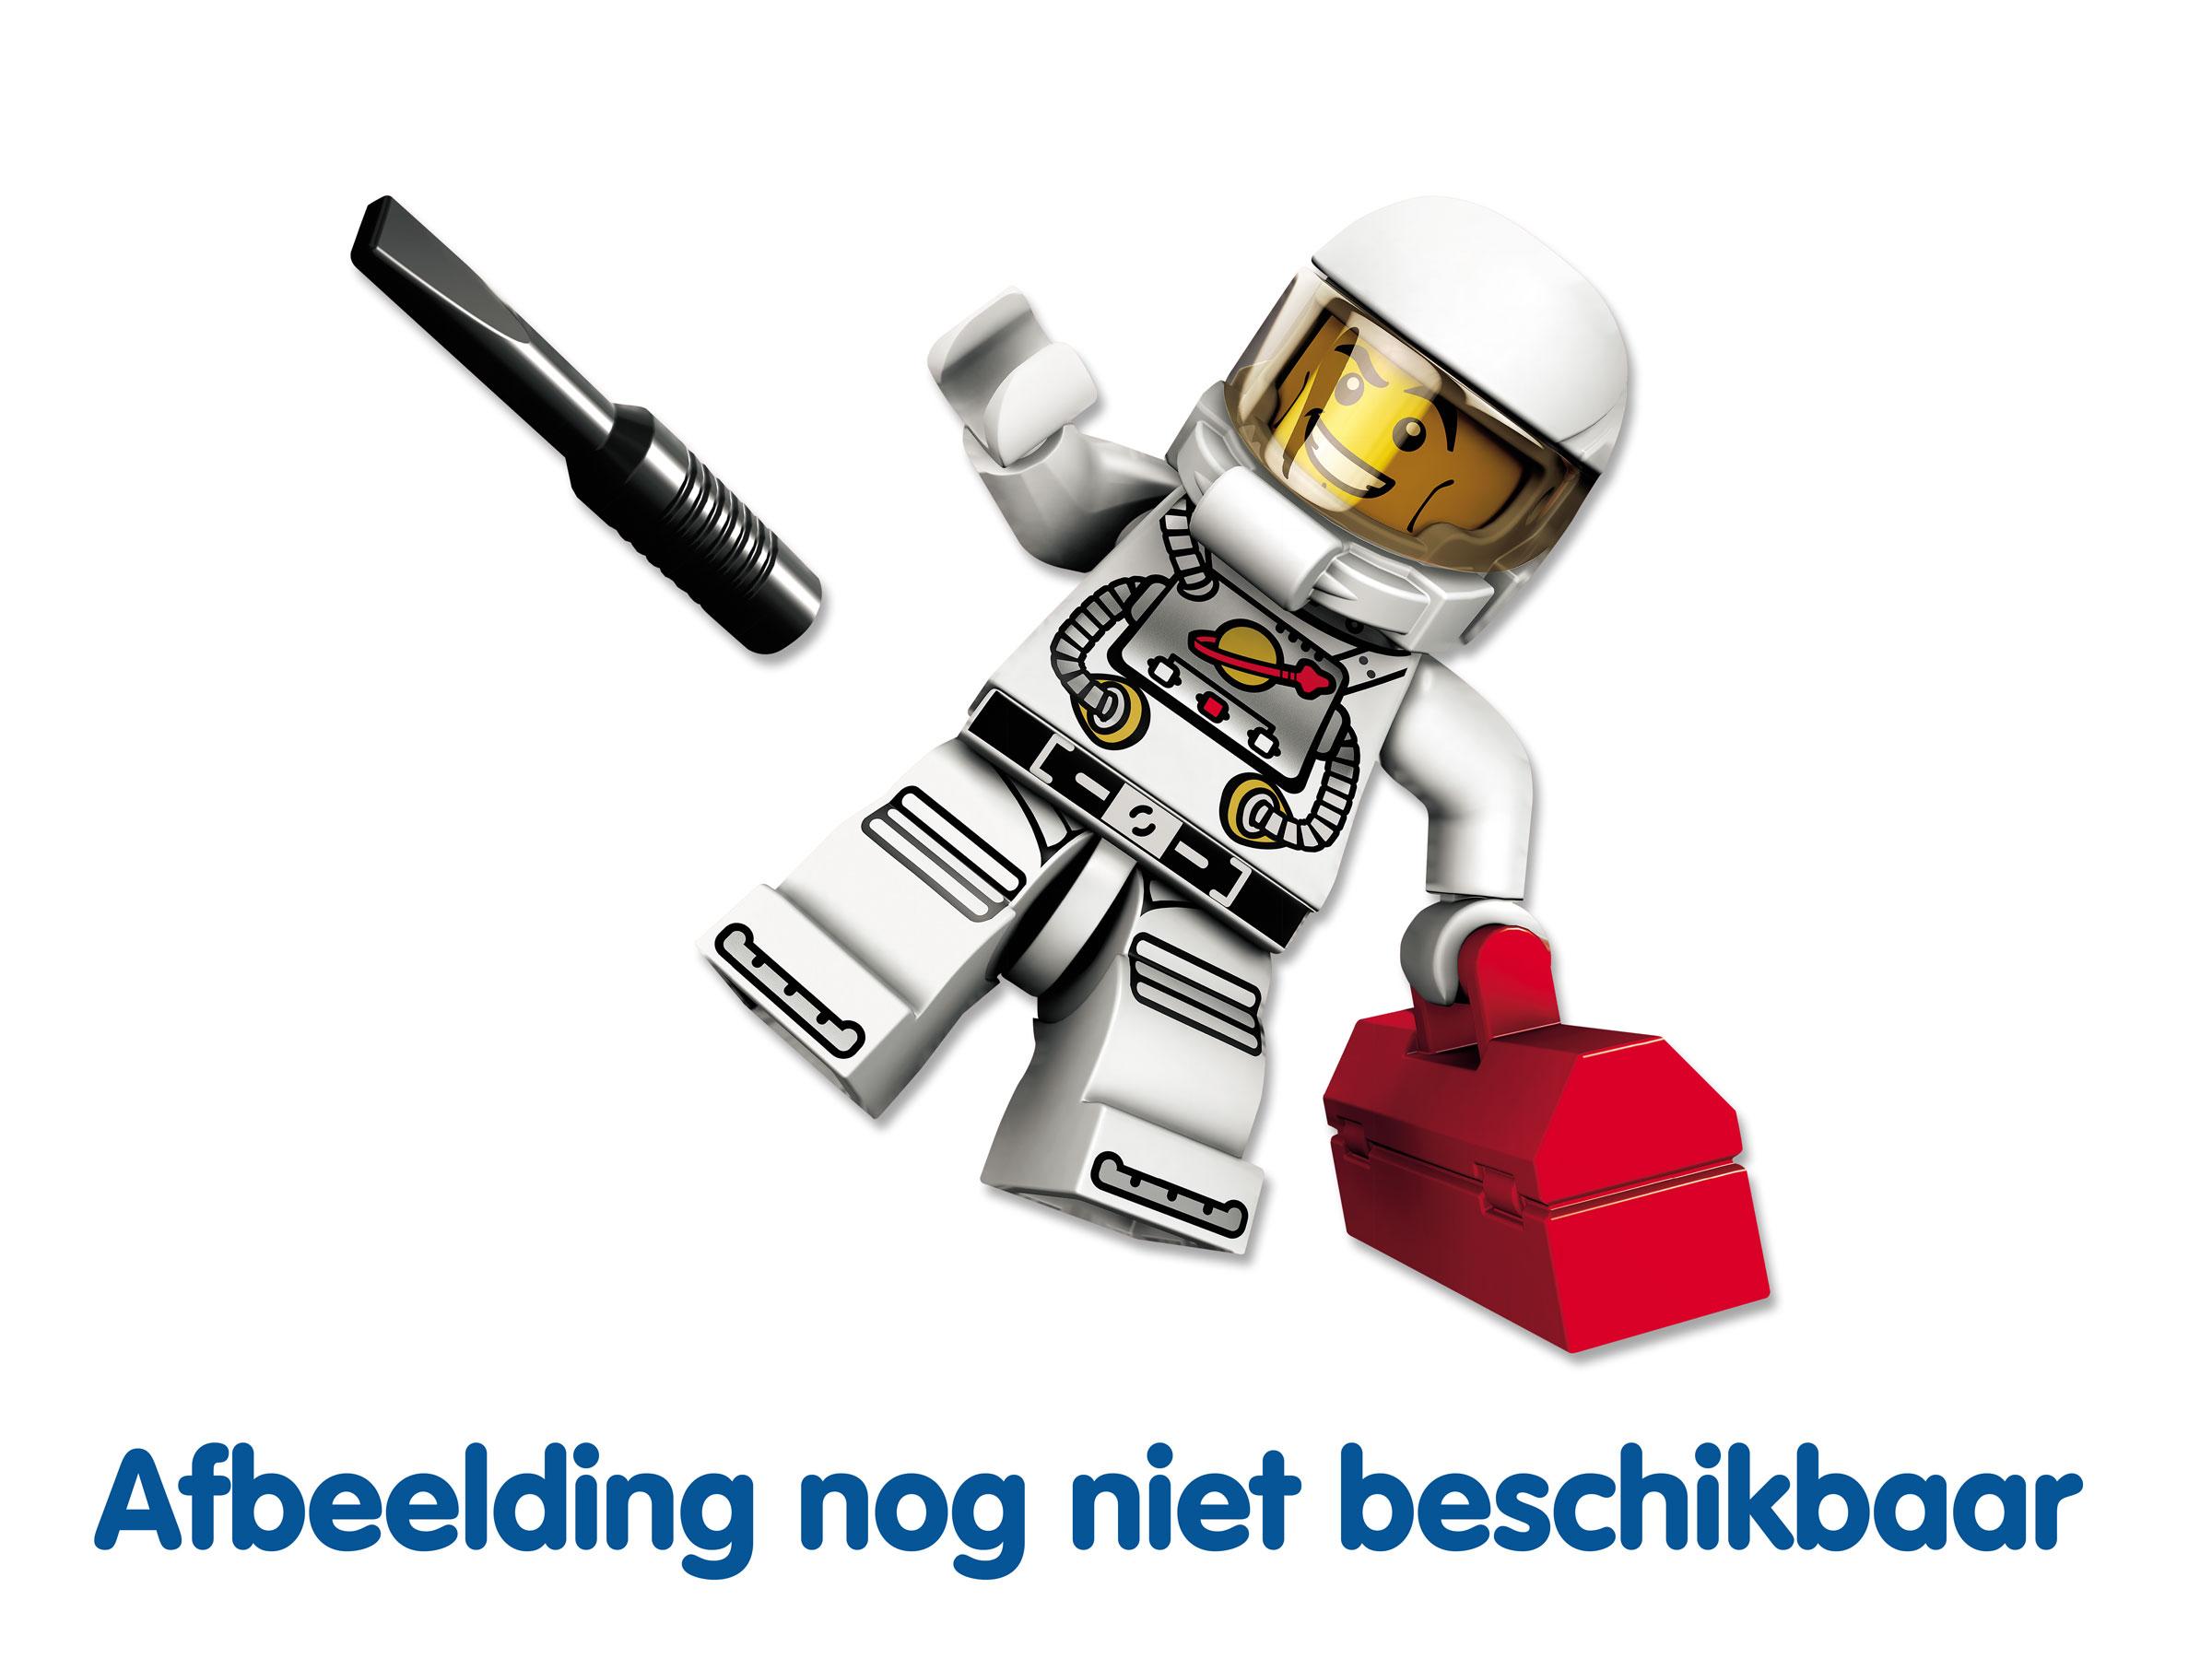 LEGO 10261 Achtbaan